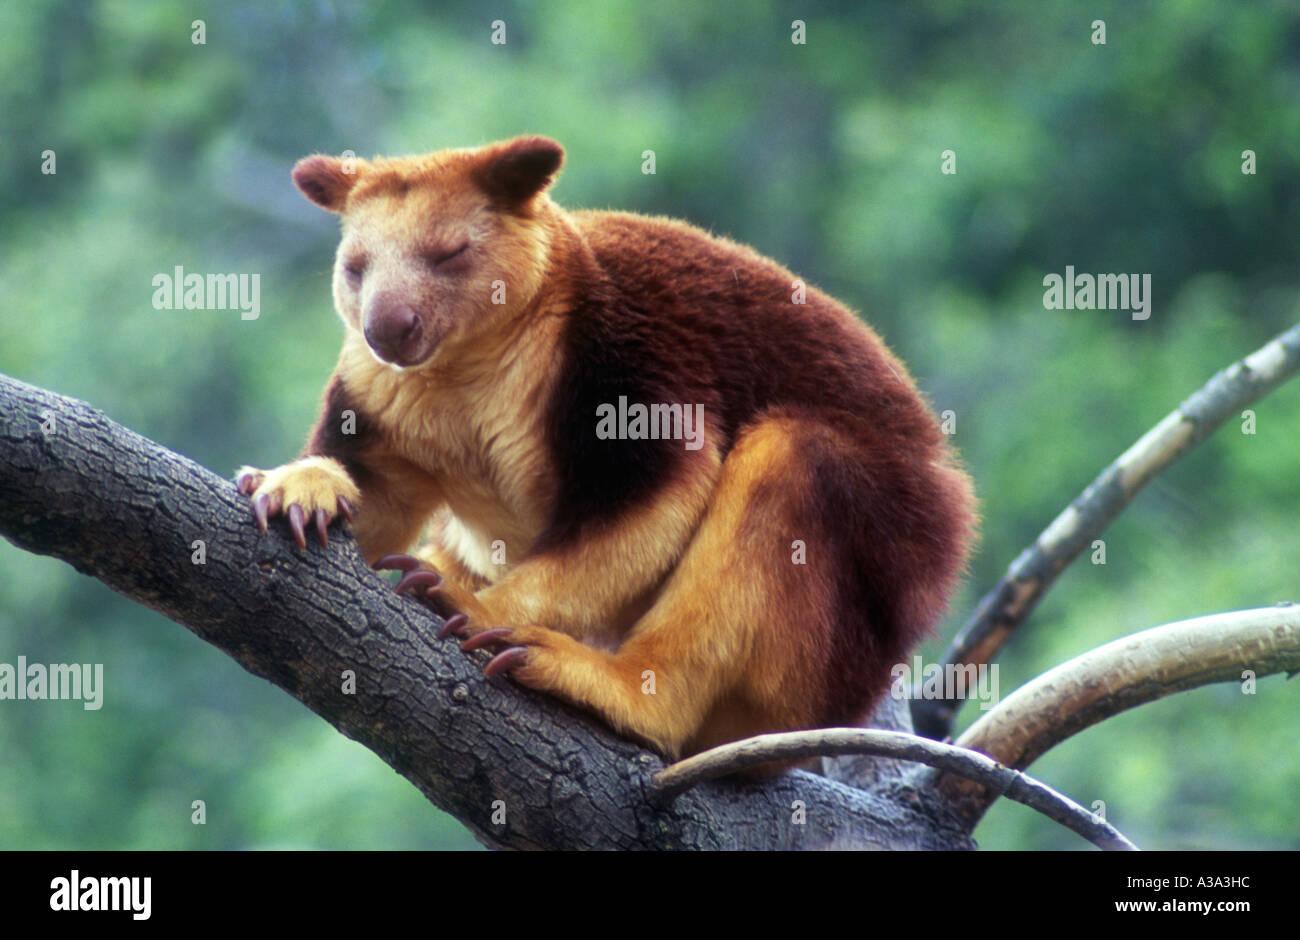 goodfellows-tree-kangaroo-dendrolagus-goodfellowi-A3A3HC.jpg